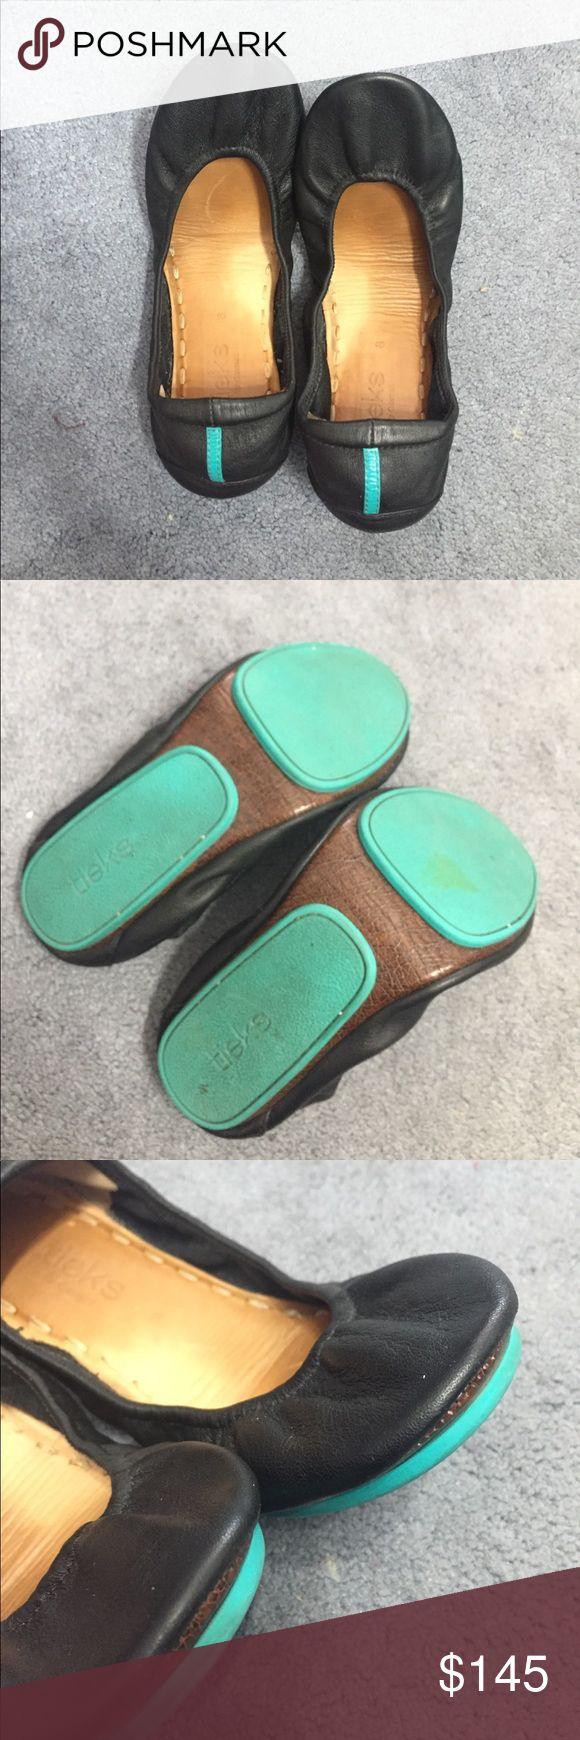 FINAL SALE✨Tieks WITH bags! Very lightly worn Tieks with storage bag and tote. Tieks Shoes Flats & Loafers